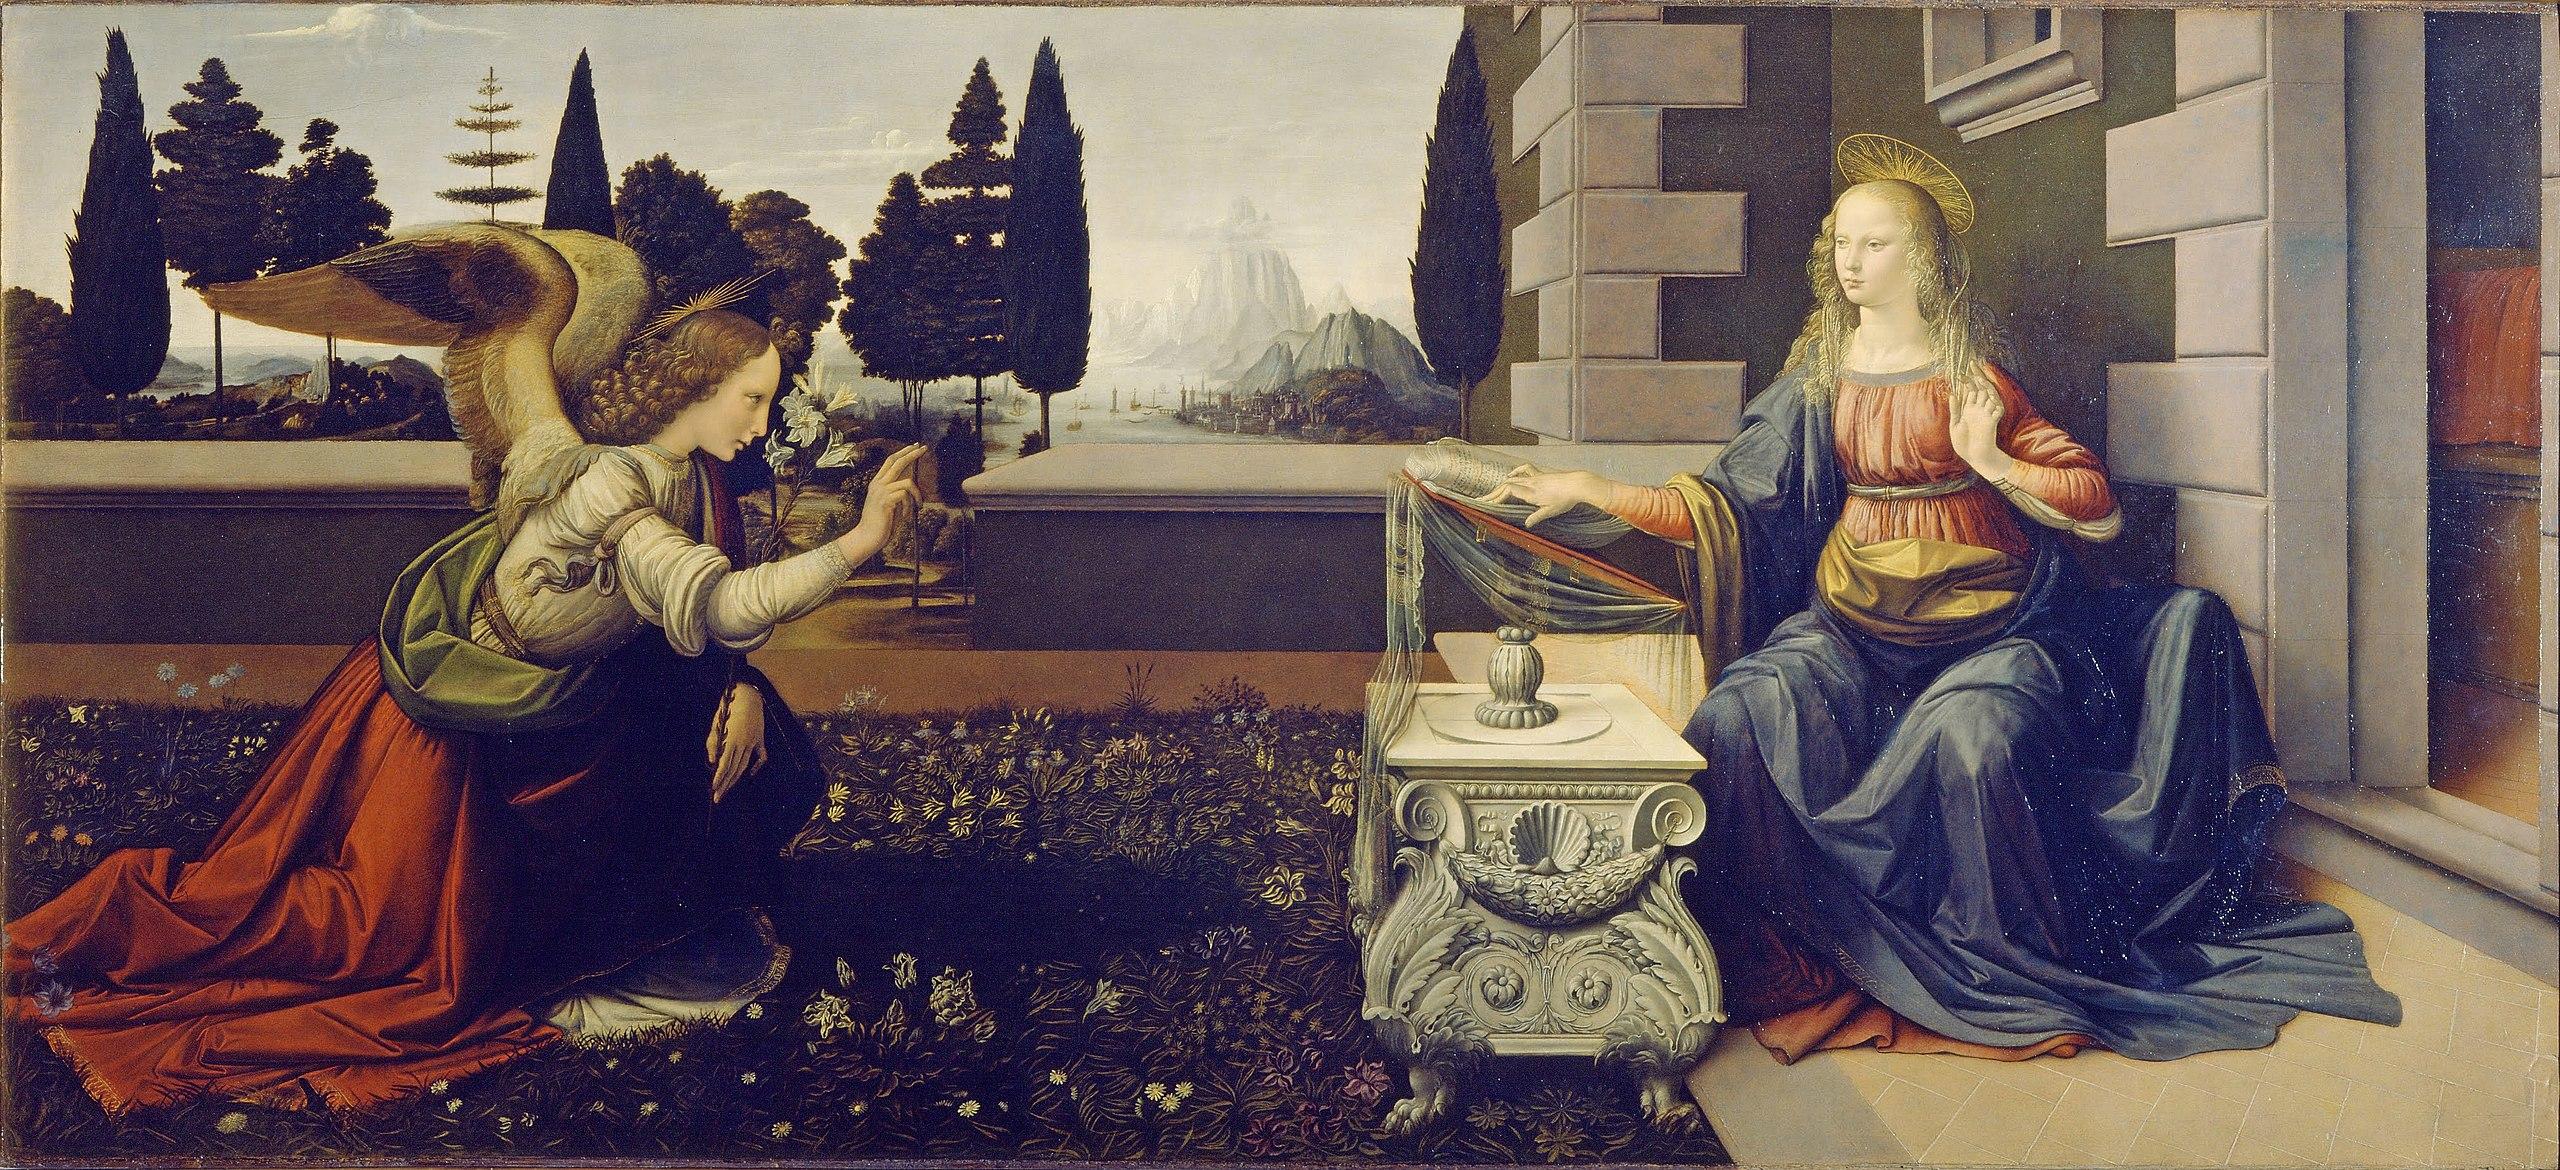 Annunciazione (Annunciation by Leonardo da Vinci)